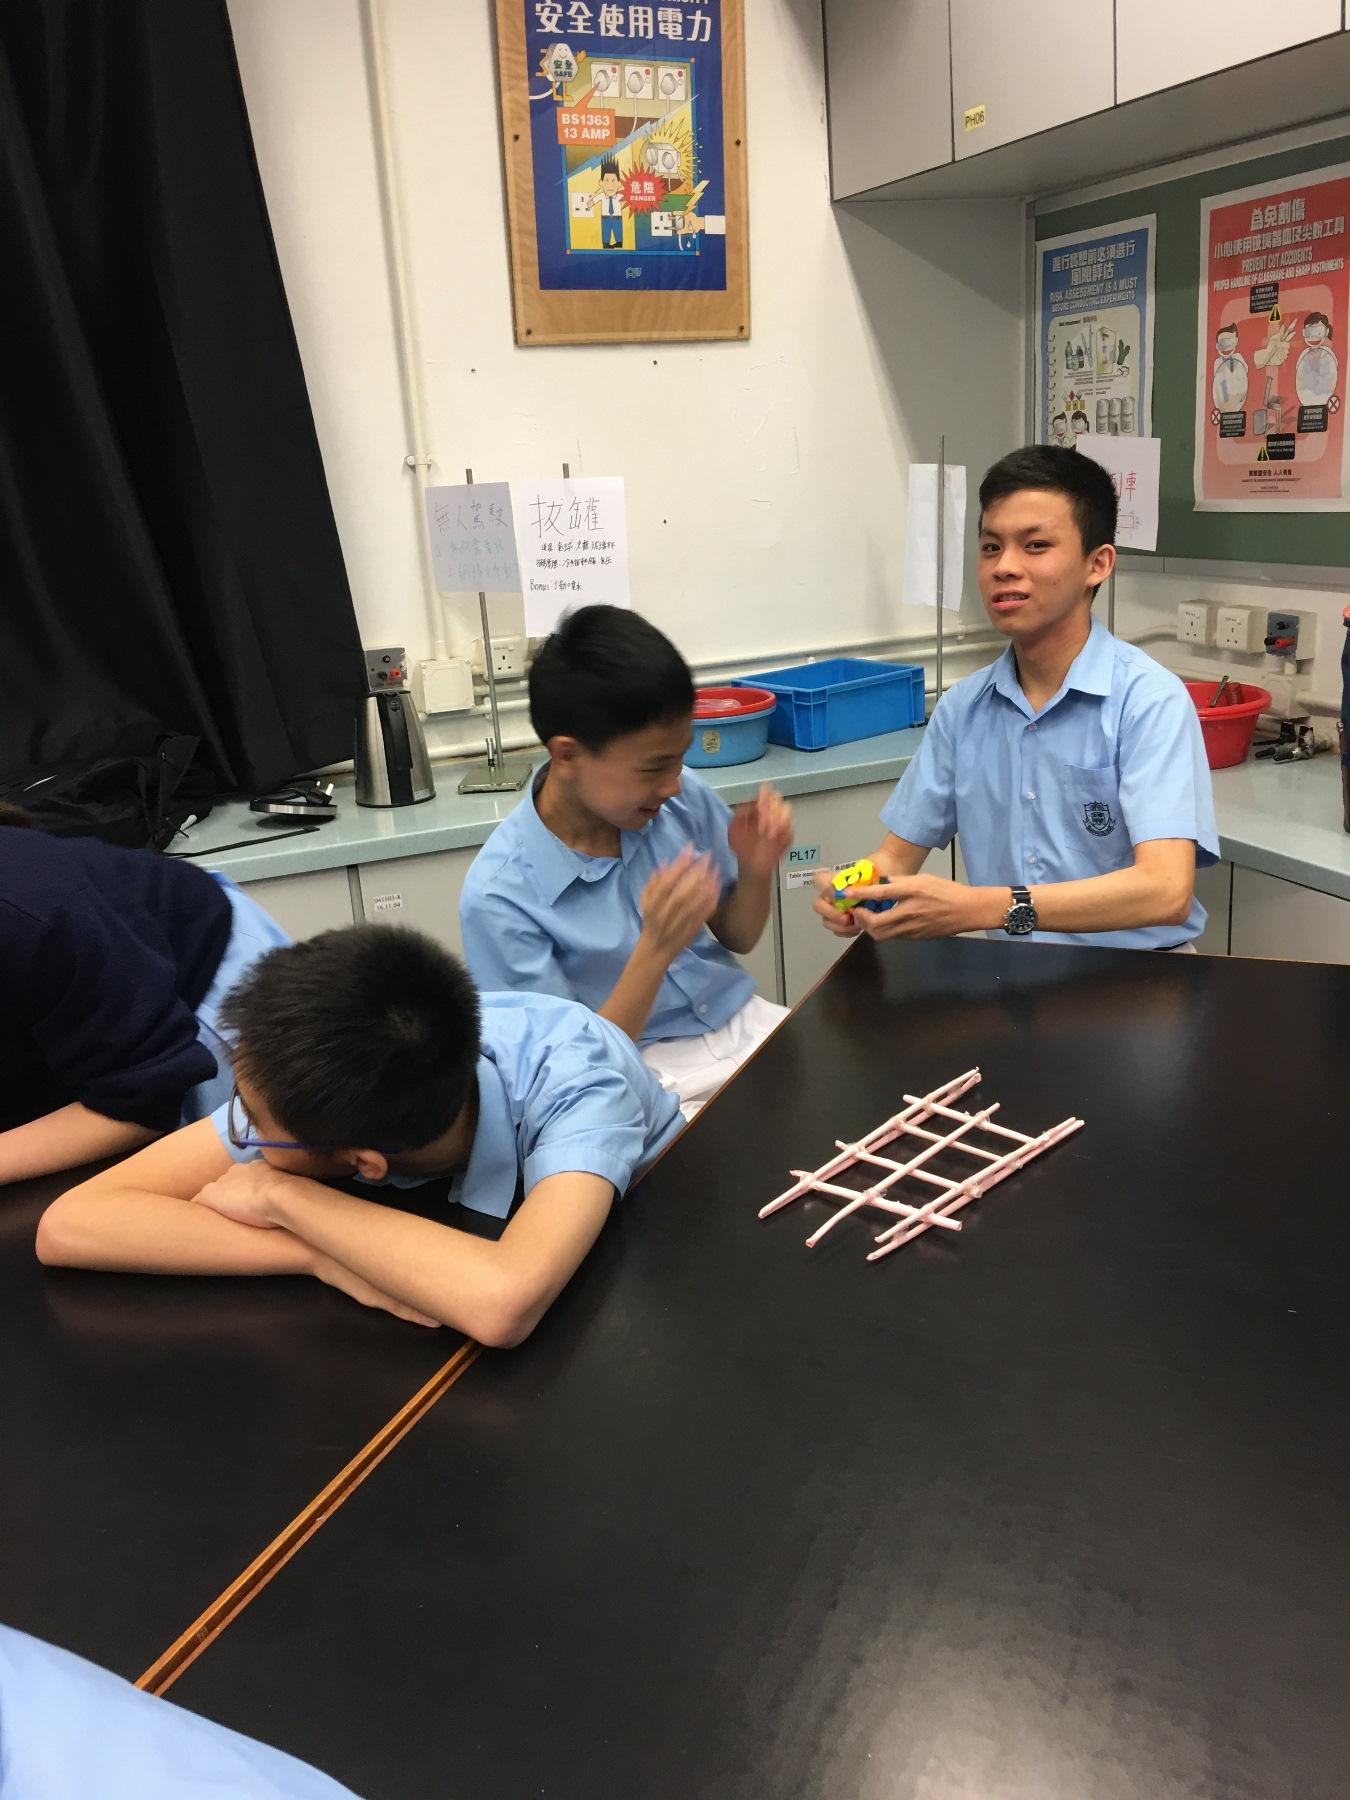 http://npc.edu.hk/sites/default/files/img_6393_1.jpg